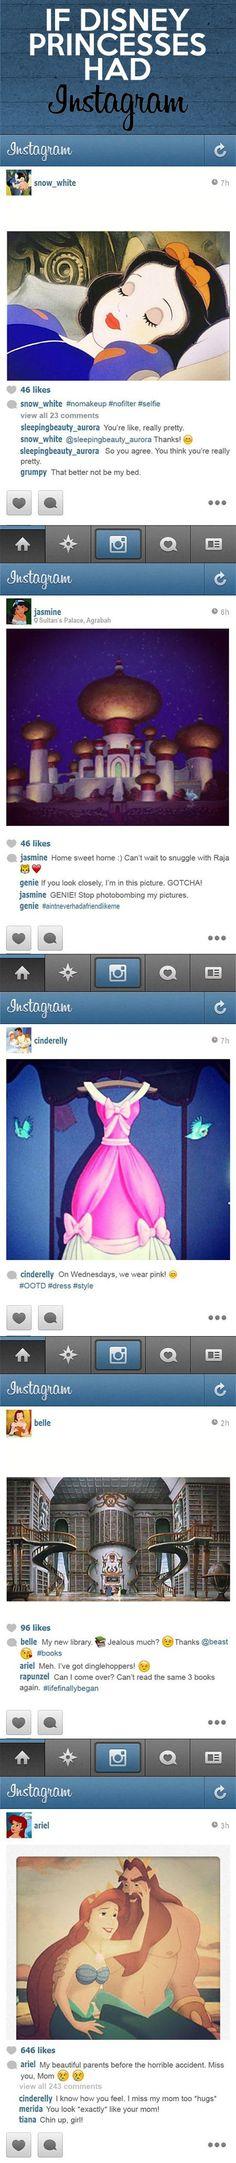 If Disney princesses had Instagram.. @Keely Hamilton Hamilton Hamilton Hamilton Gault Gault Gault Ripley